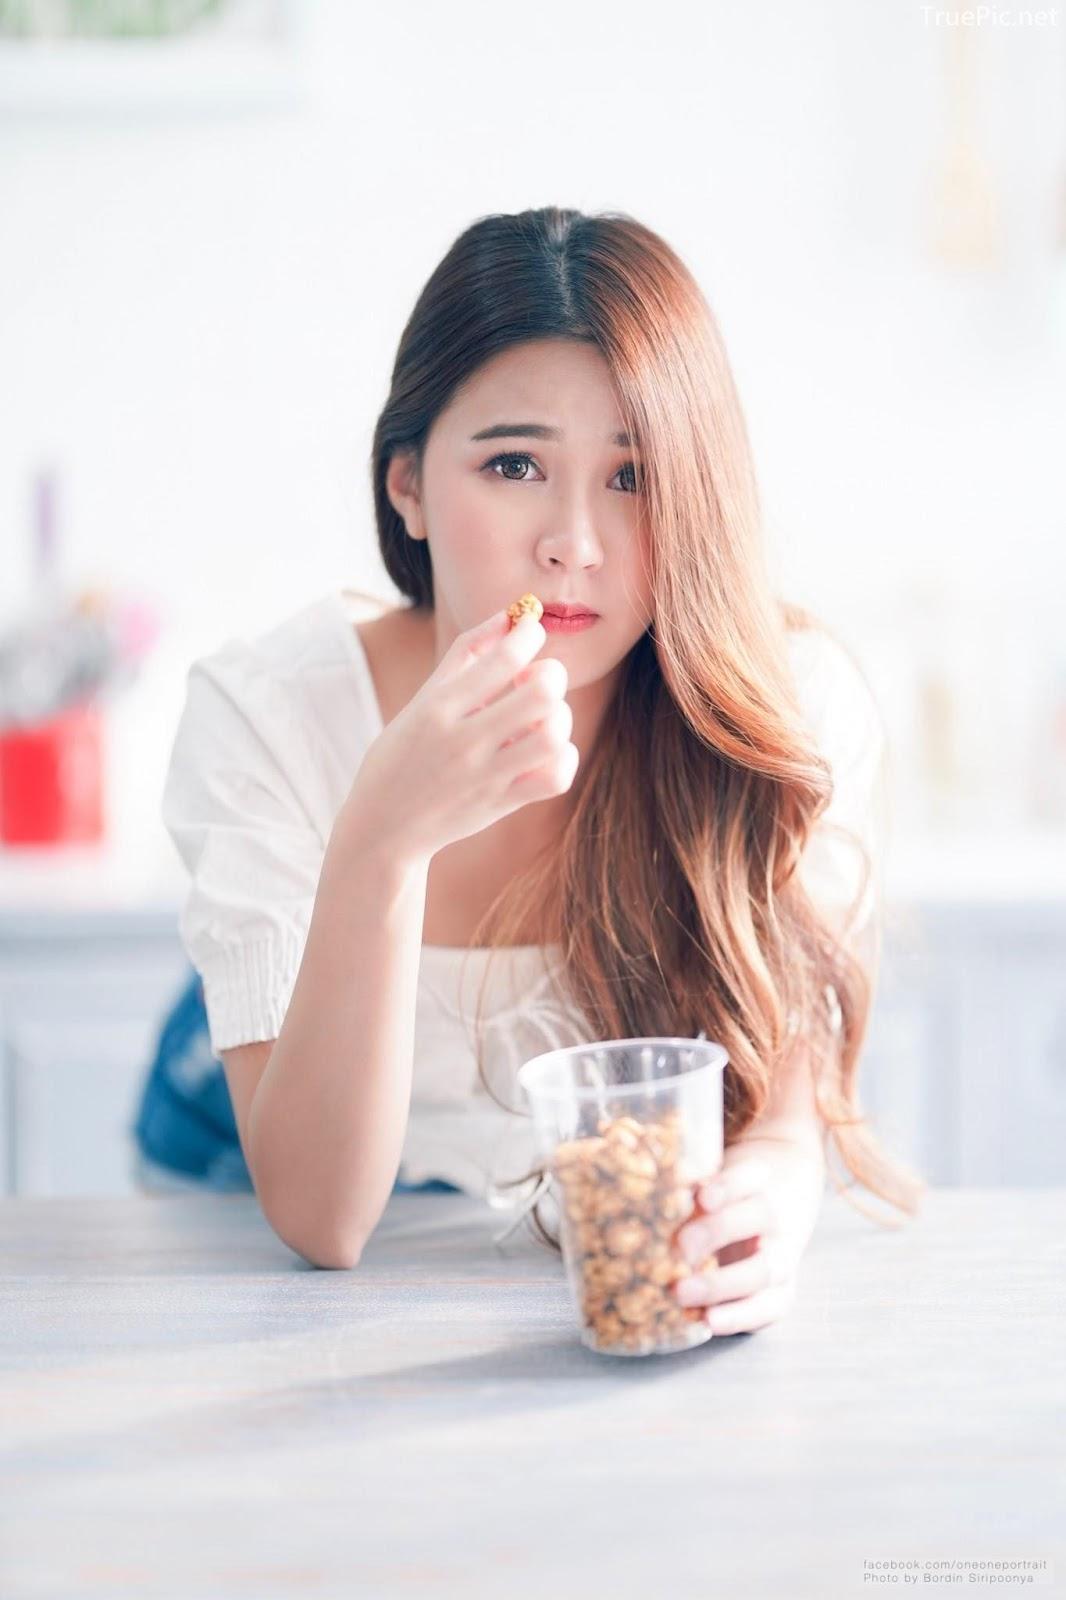 Thailand cute model Supansa Yoopradit (Lorpor) - Lovely smile girl - Picture 2